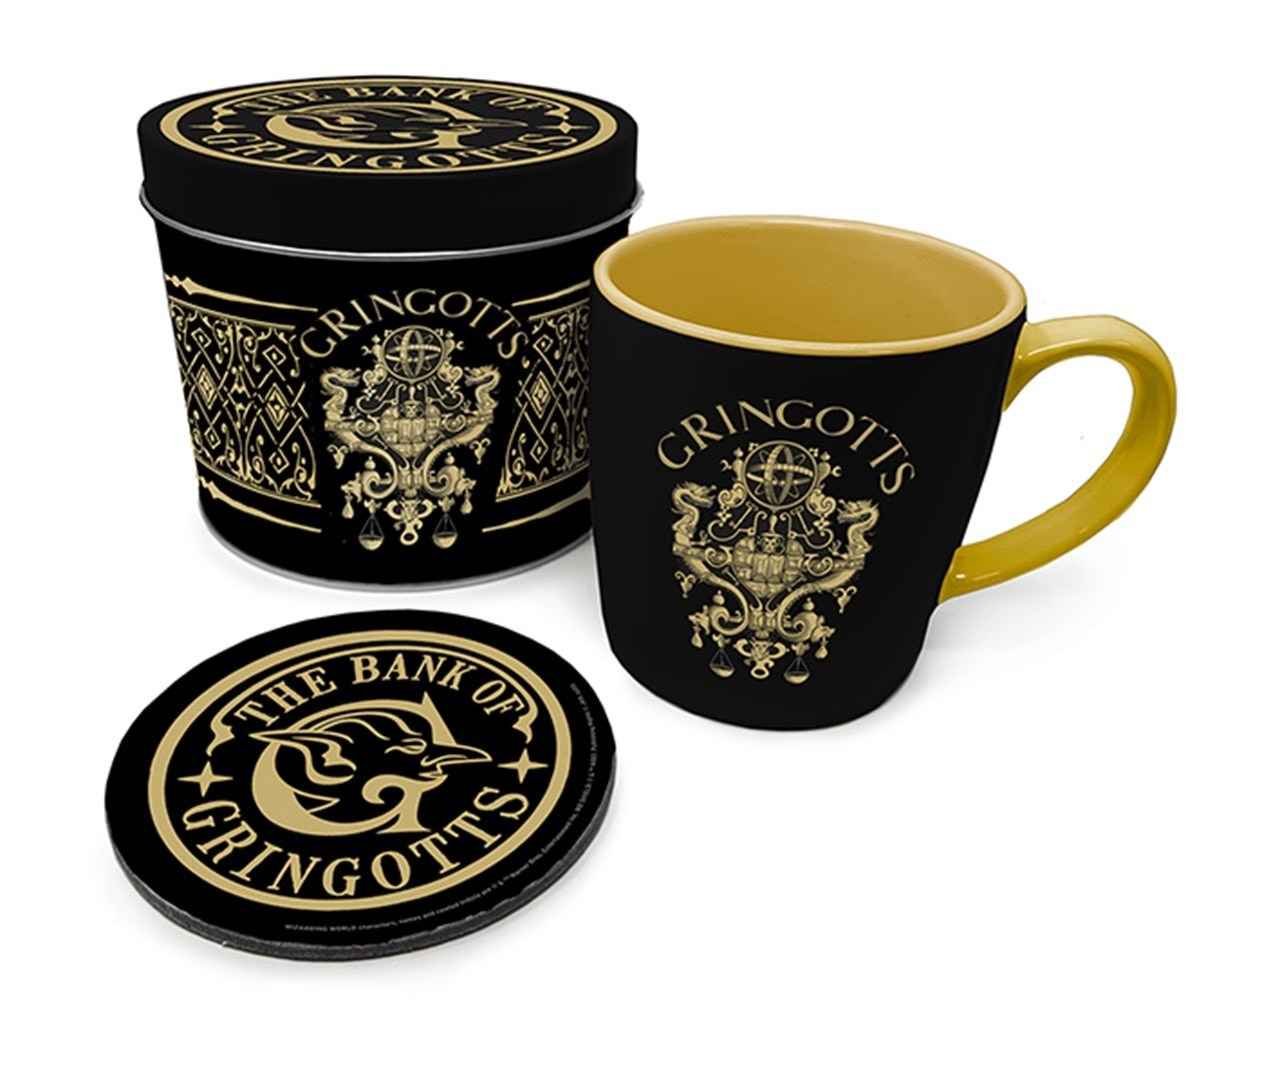 Harry Potter: Gringotts Mug Gift Set in Tin - 1